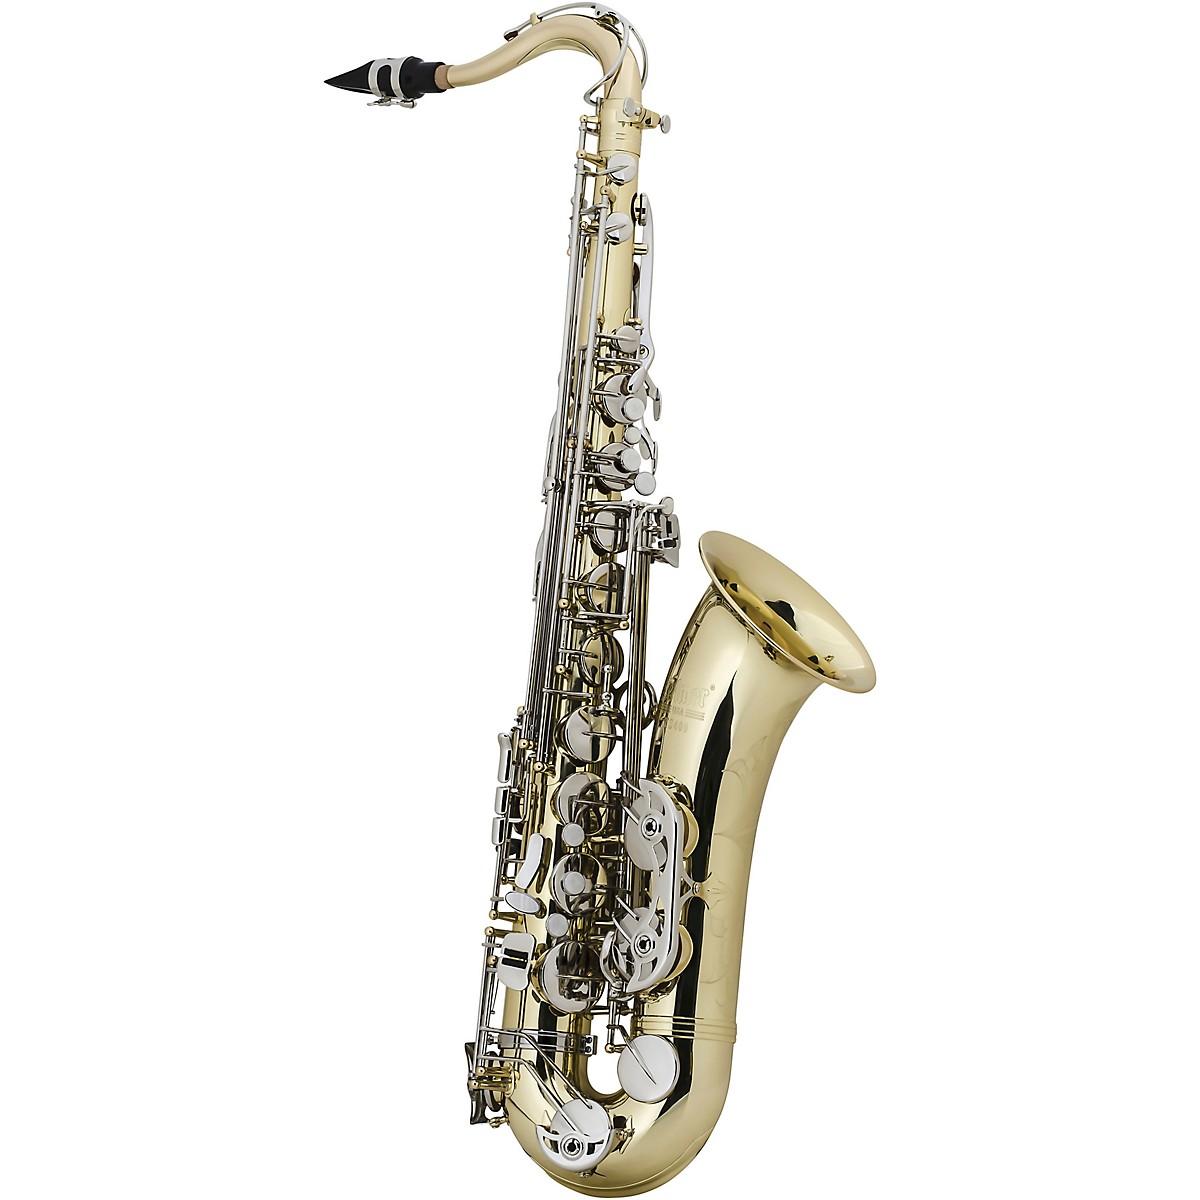 Selmer 400 Series Tenor Saxophone